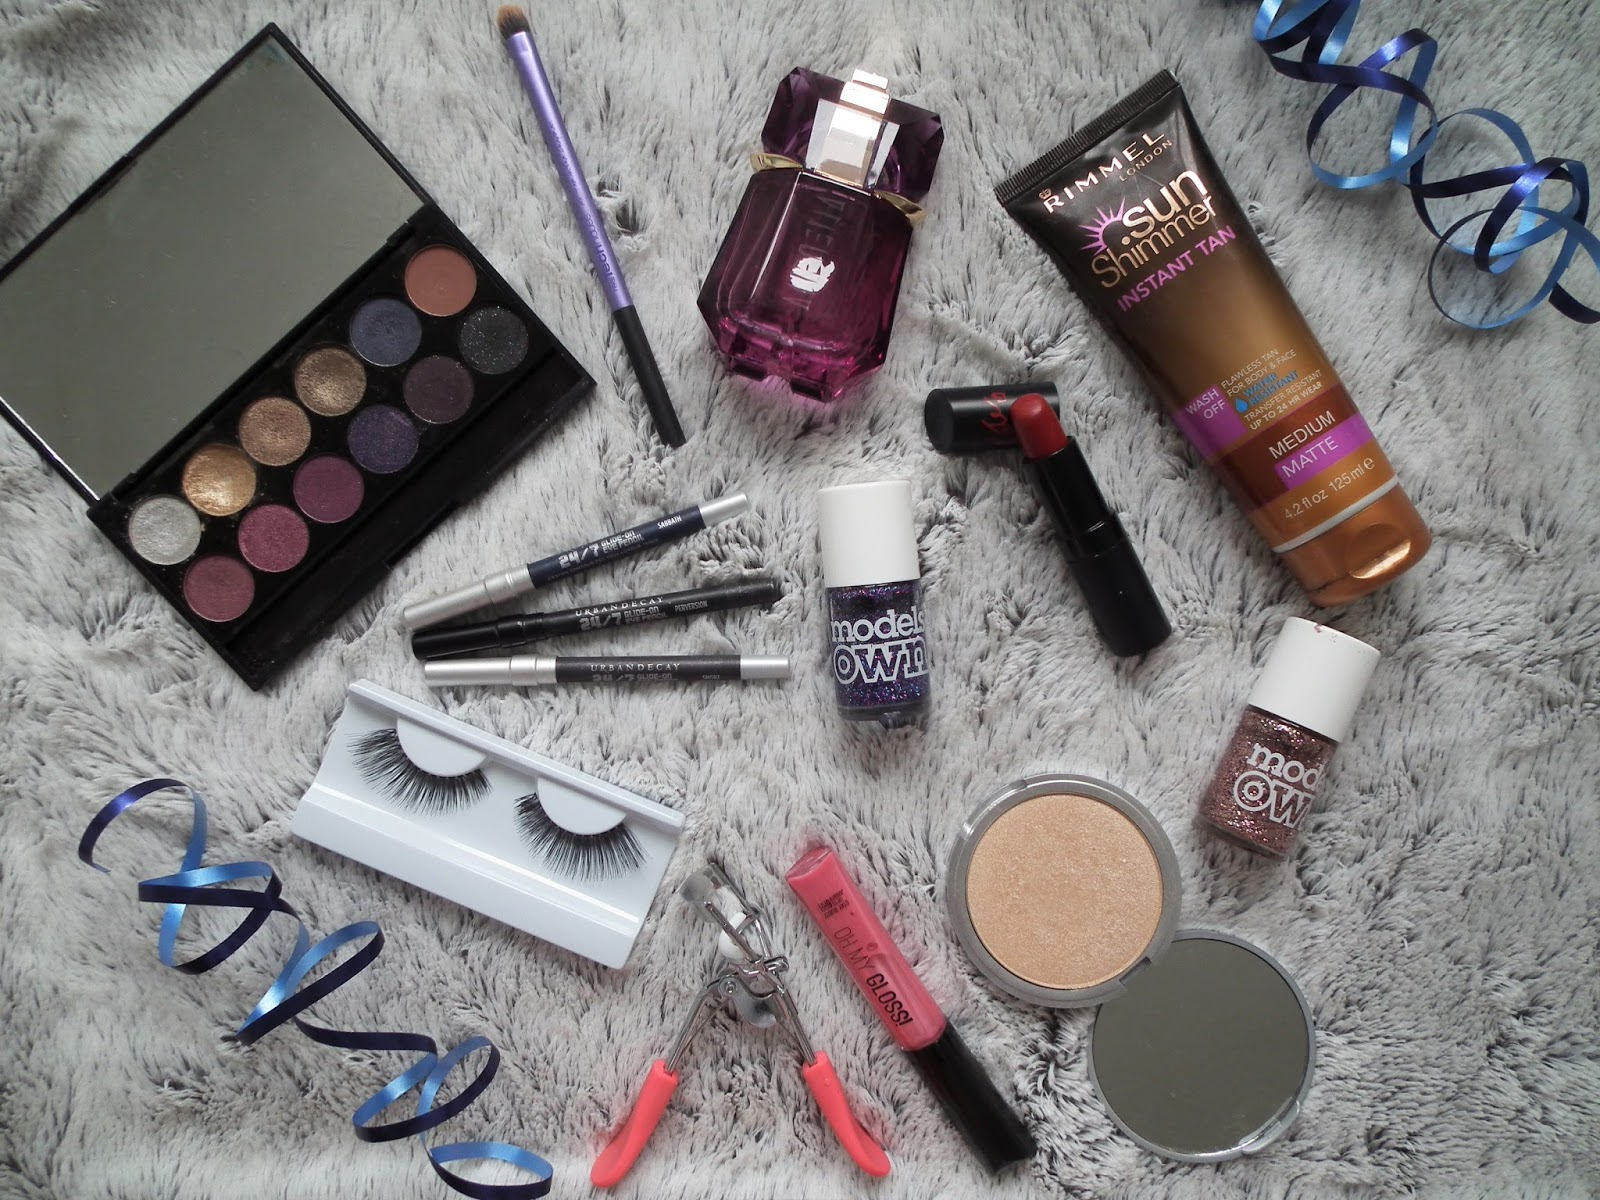 Party Season Beauty Essentials